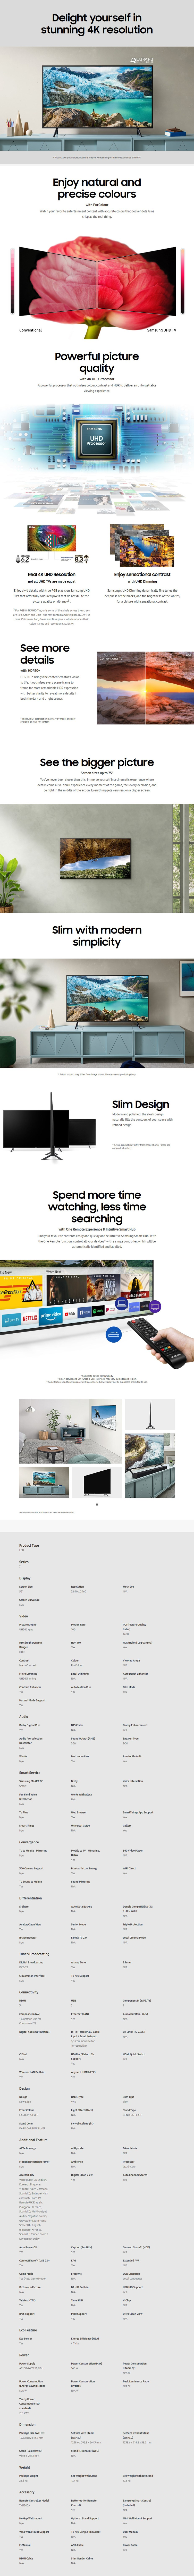 "Samsung Series 7 UA55RU7100WXXY 55"" 4K UHD Smart LED TV - Desktop Overview 1"